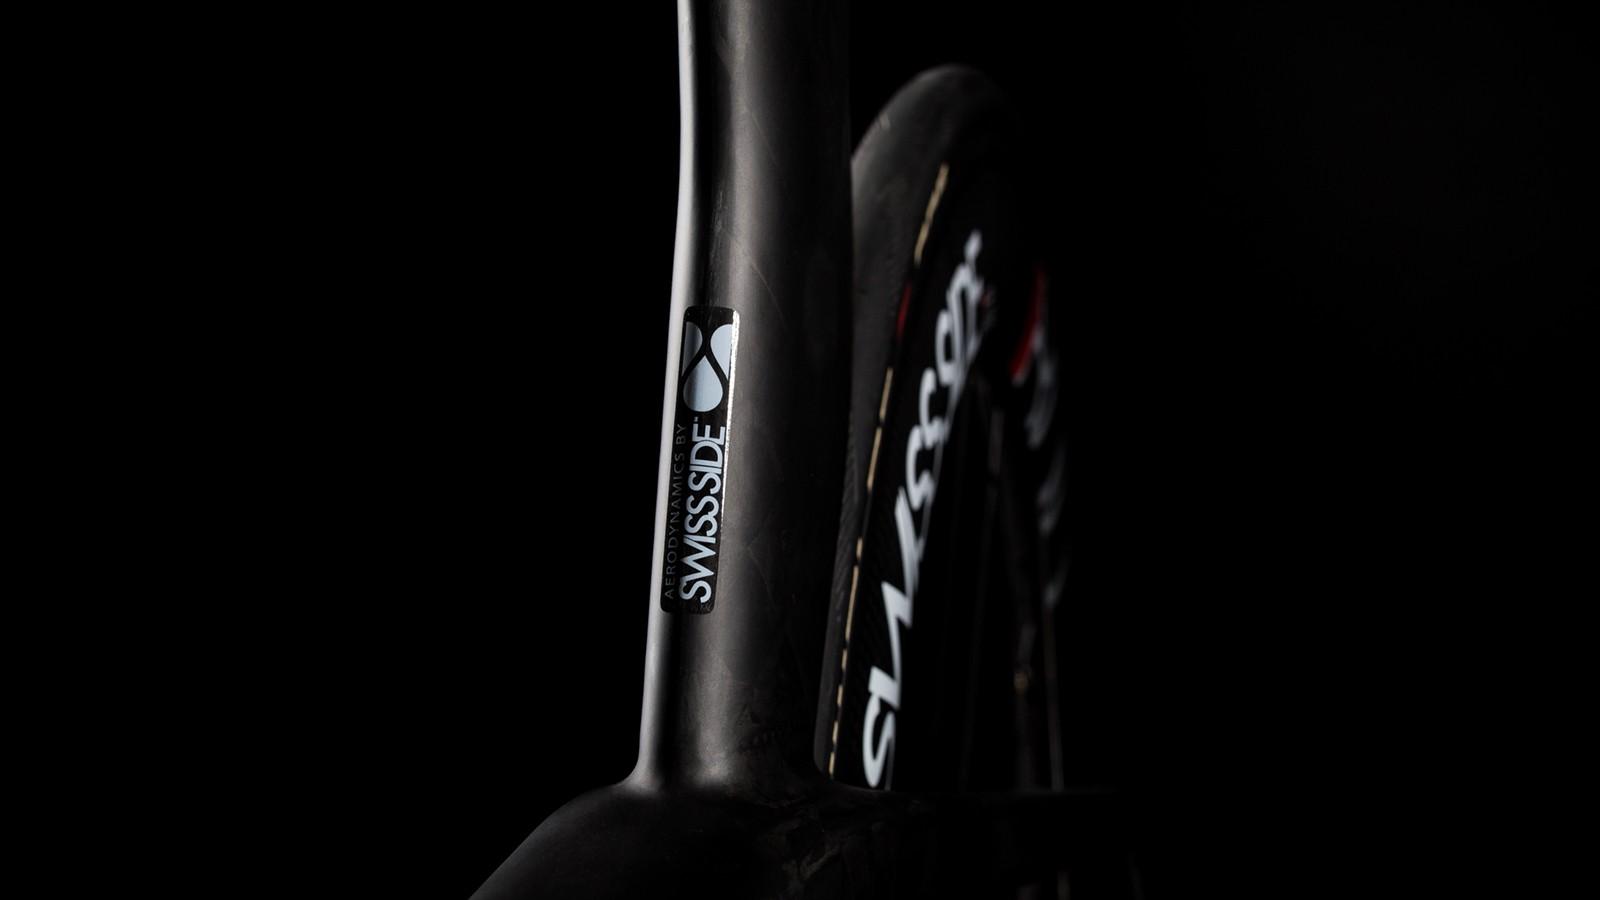 The bike was developed in conjunction with Swiss aerodynamic specialists Swiss Side